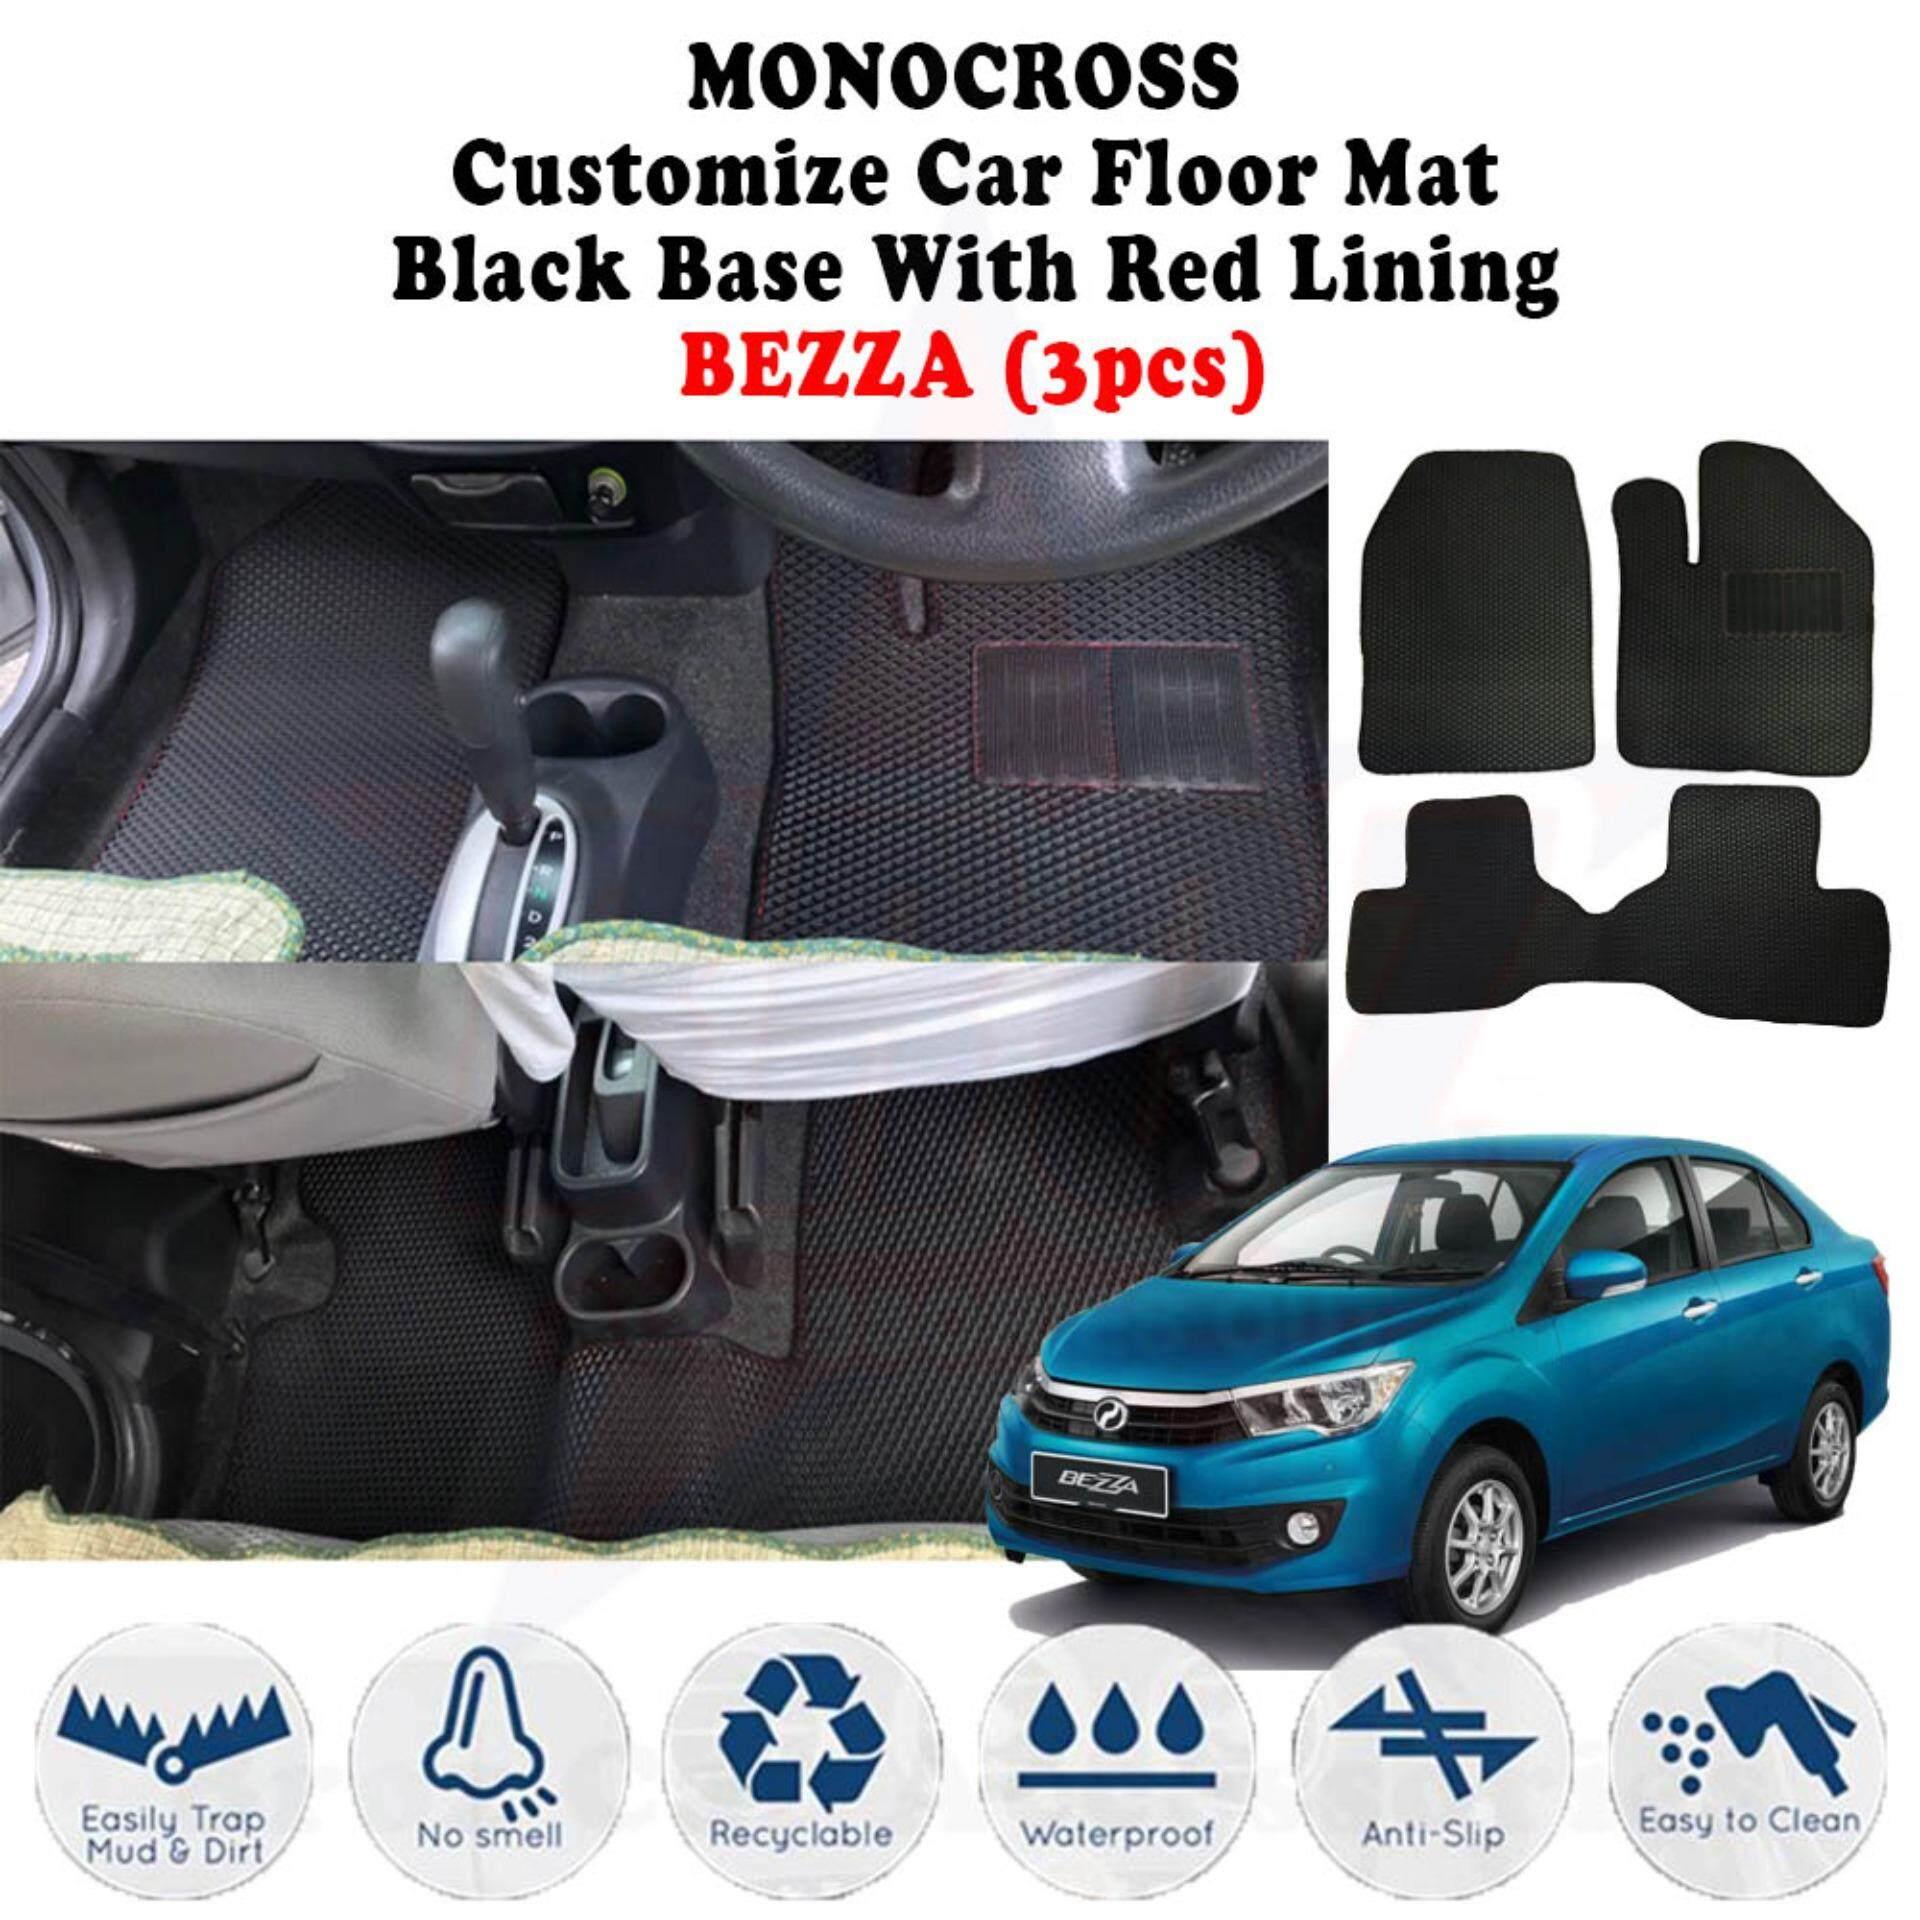 Airvo MONOCROSS Car Mat Customize Floor Mat Black Base With Red Lining - Bezza (3pcs)